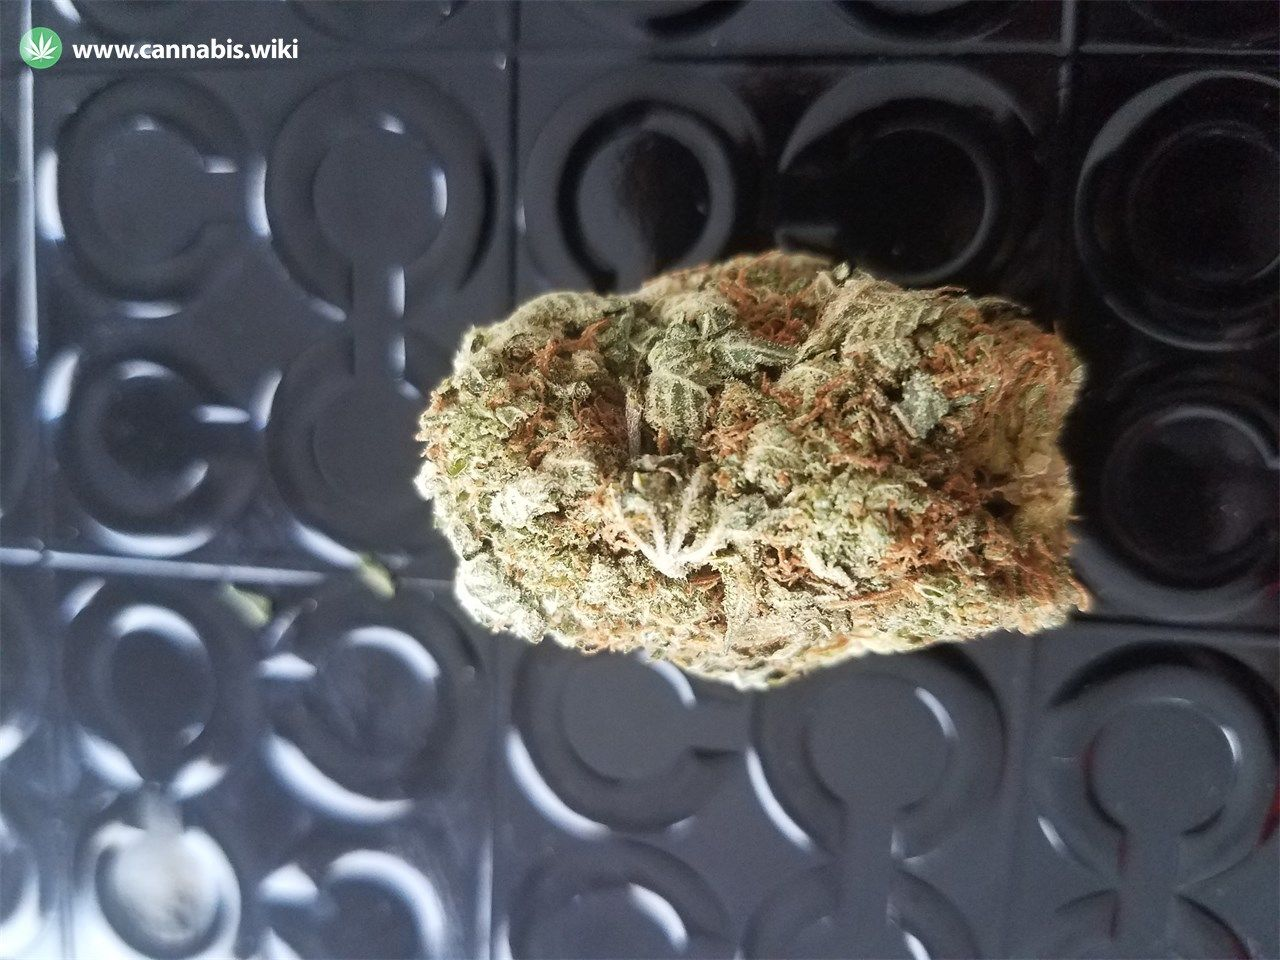 Cannabis Wiki - Strain 707 Headband - 707 - Hybrid